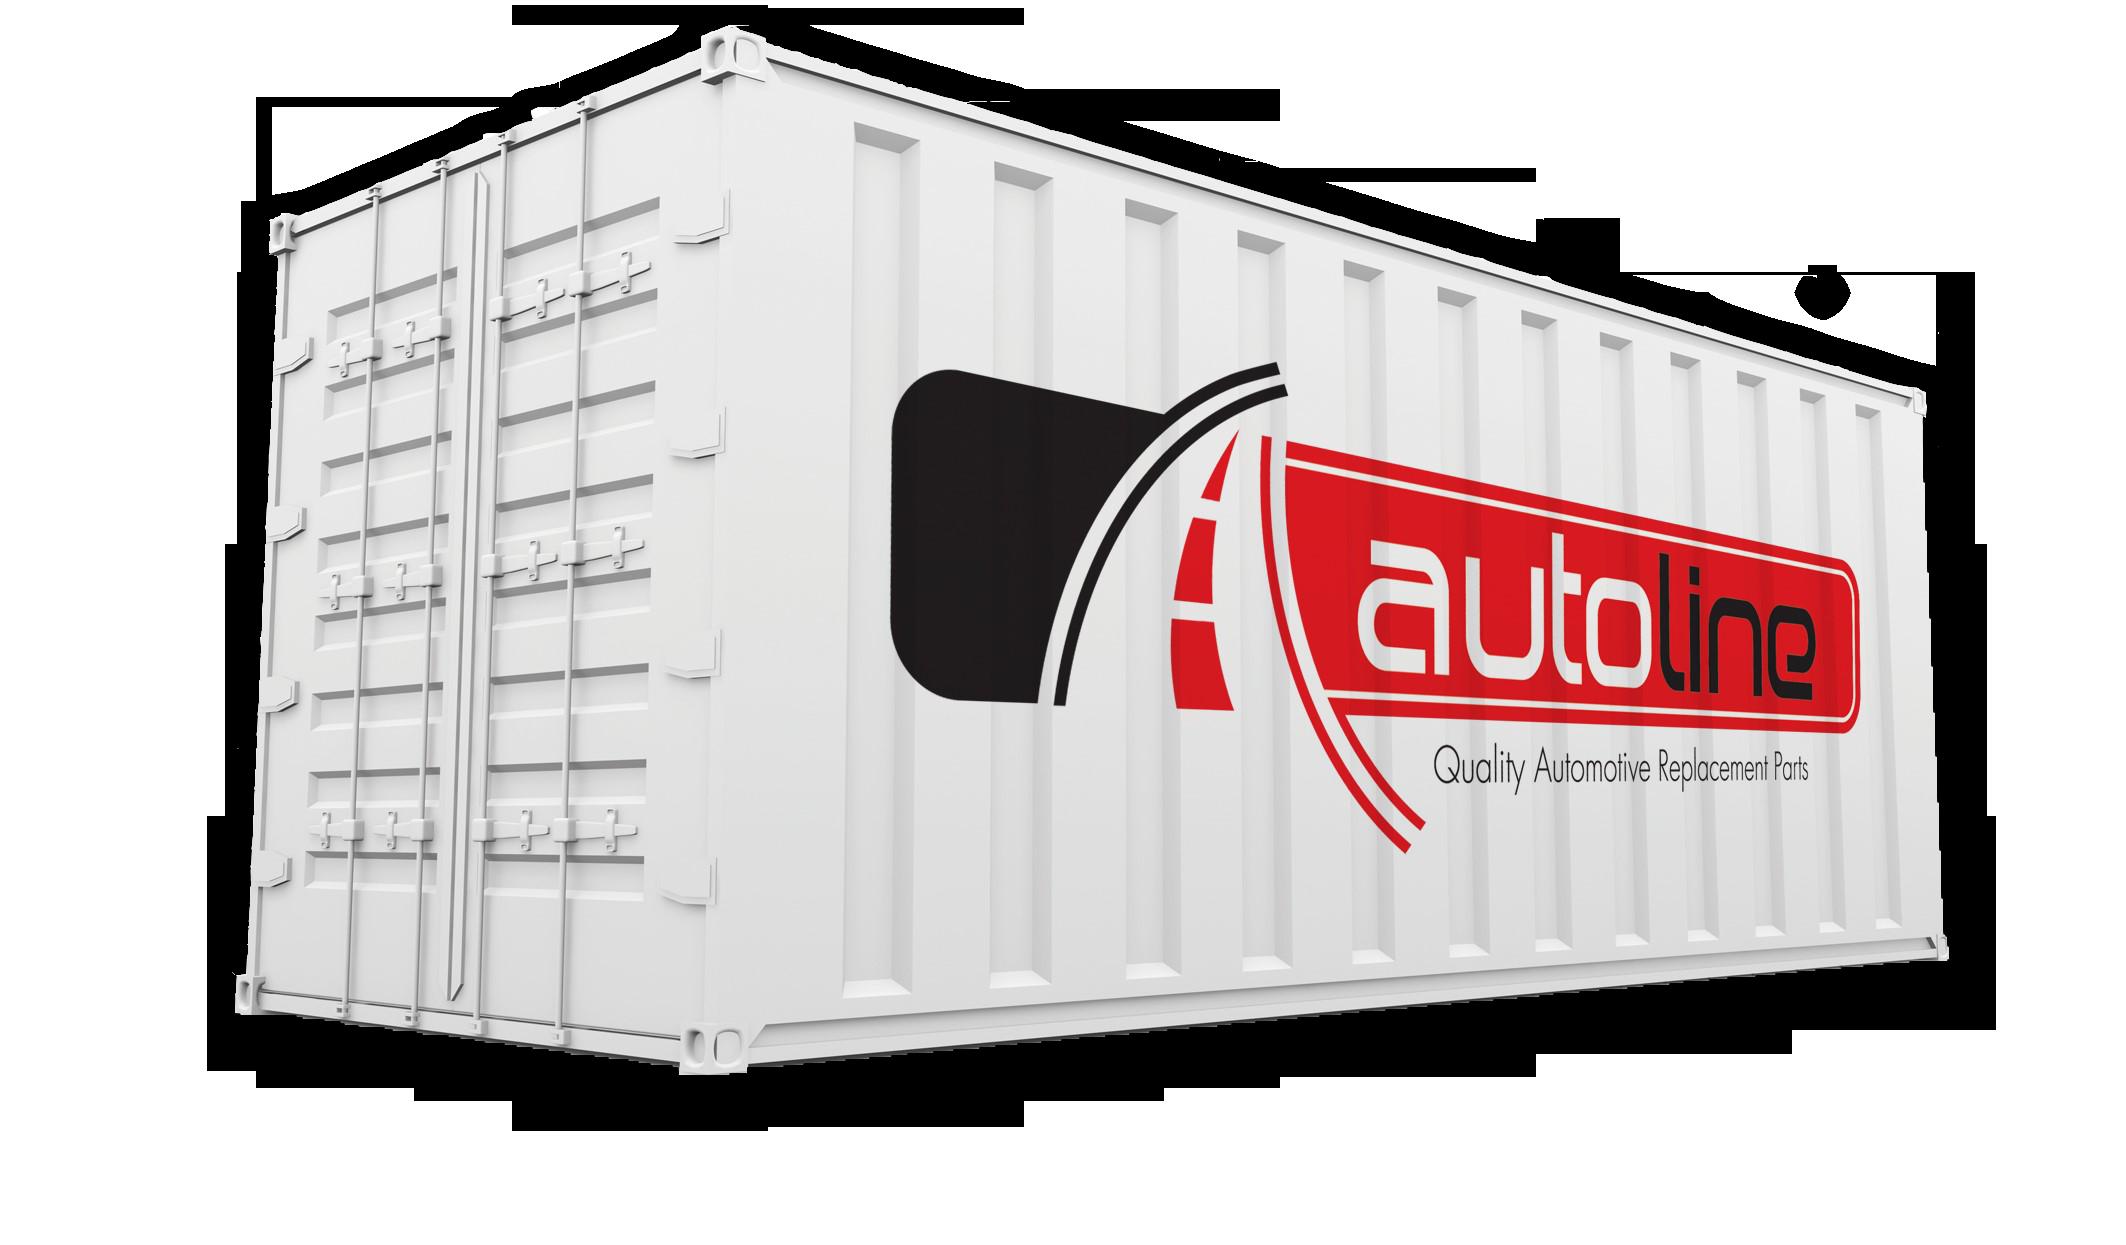 Autoline Consignment Solution